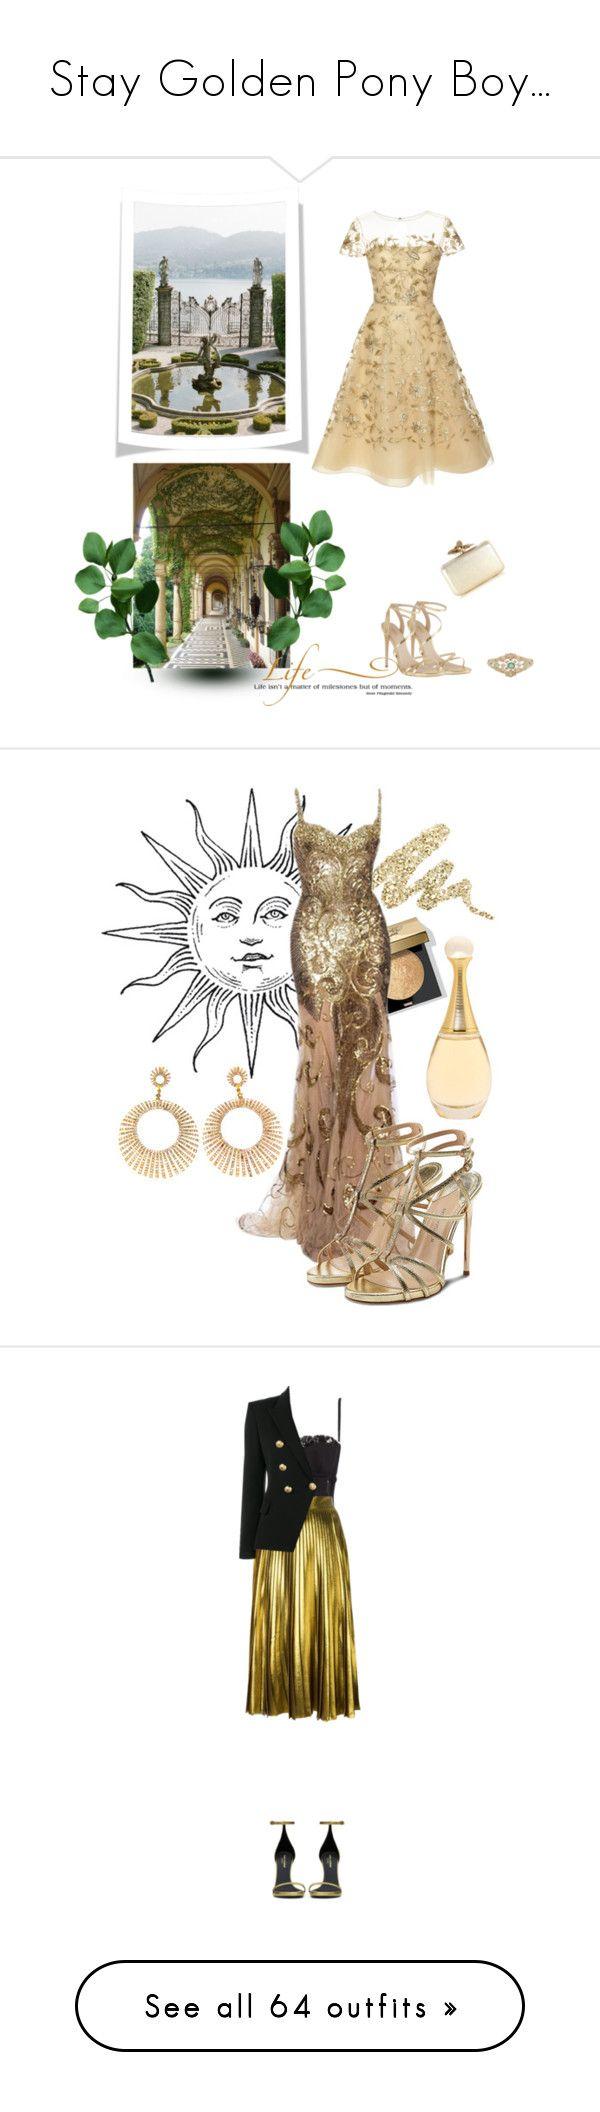 """Stay Golden Pony Boy..."" by mrs-snow ❤ liked on Polyvore featuring Oscar de la Renta, Carvela, WALL, Karen Millen, Urban Decay, Bobbi Brown Cosmetics, Bensimon, Paul Andrew, Christian Dior and Dolce&Gabbana"